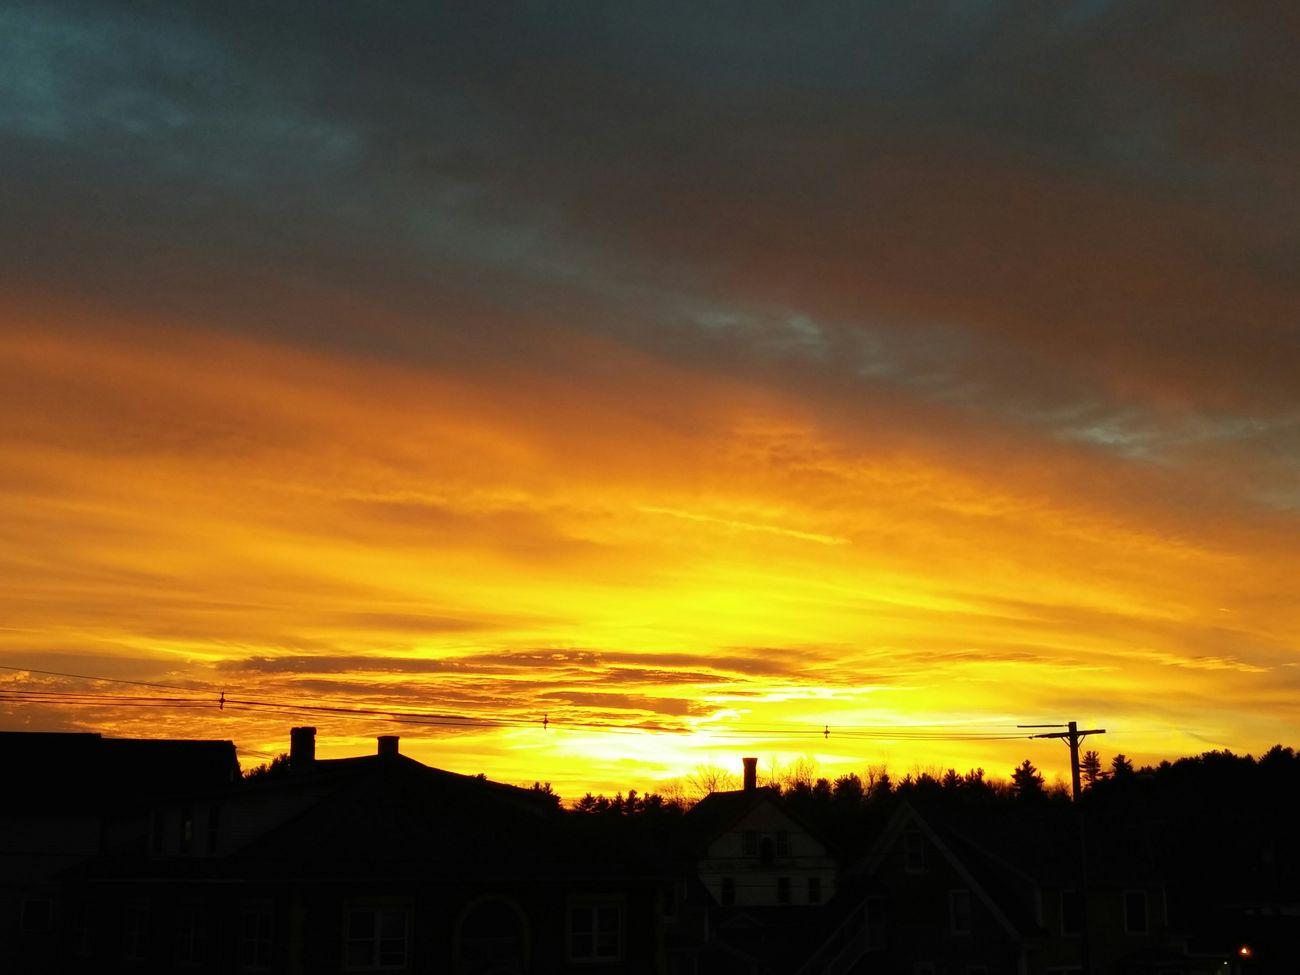 Nofilter Sunset Dramatic Skies Lookslikeheaven Newhampshire Skyline RedSkiesAtNight